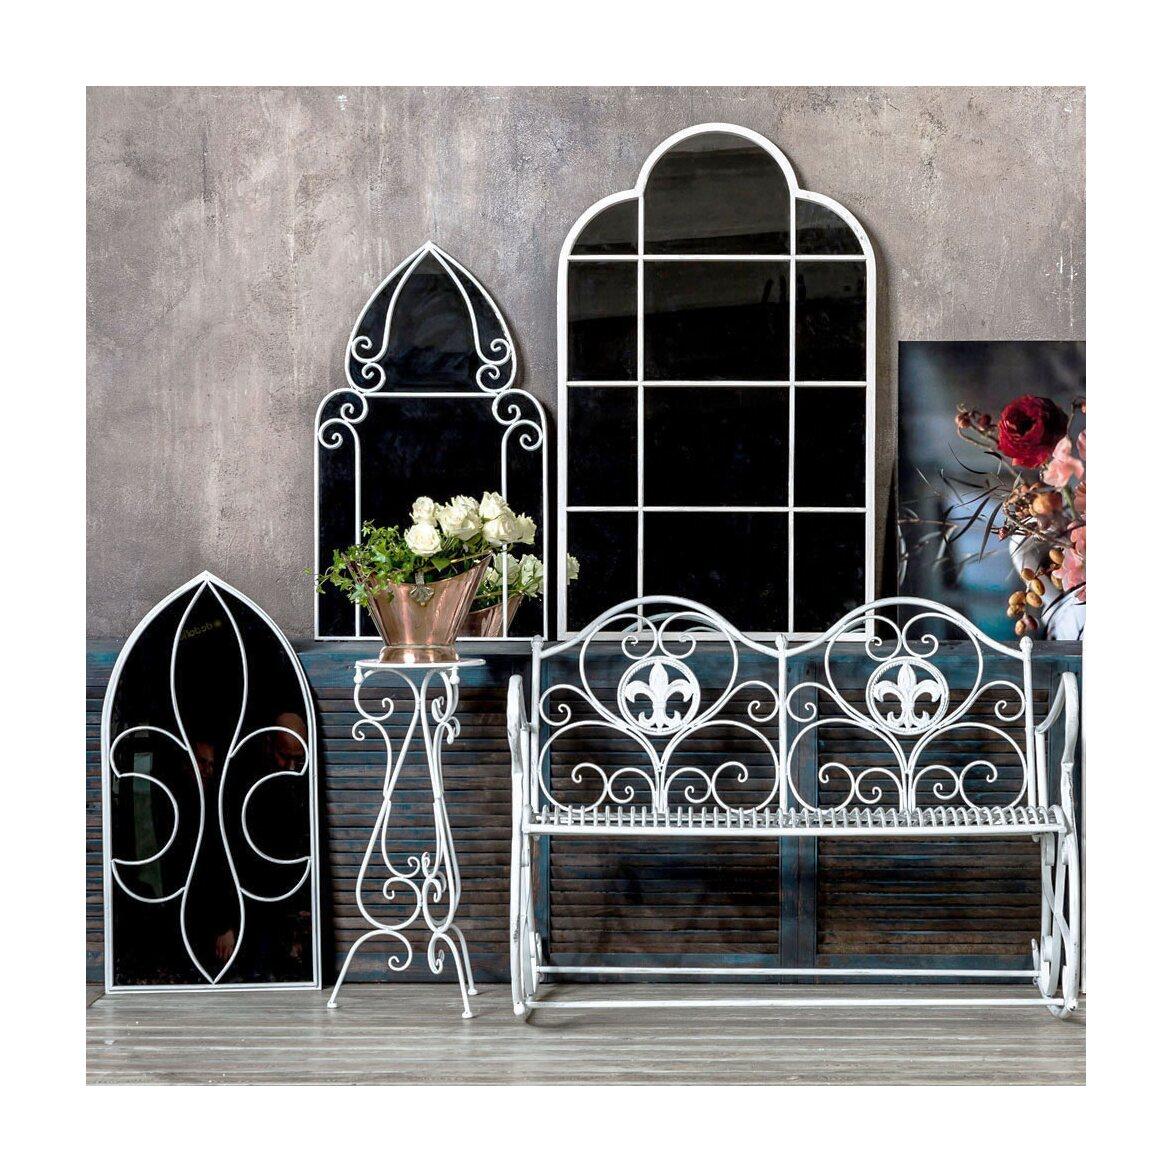 Настенное зеркало «Флореаль» (белый антик) 3 | Настенные зеркала Kingsby